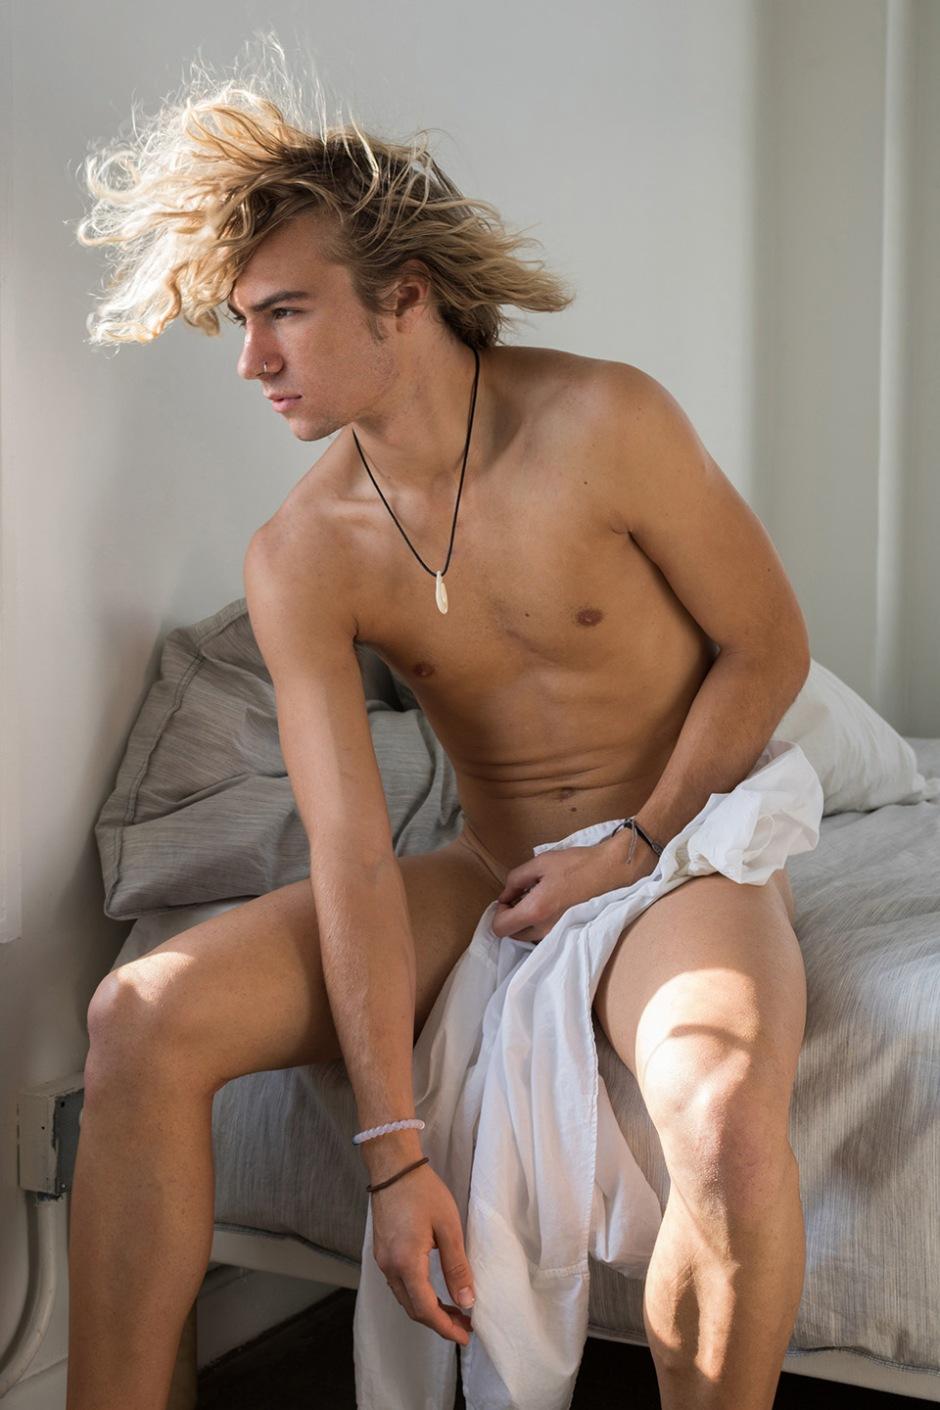 NathanielByBenVeronis18